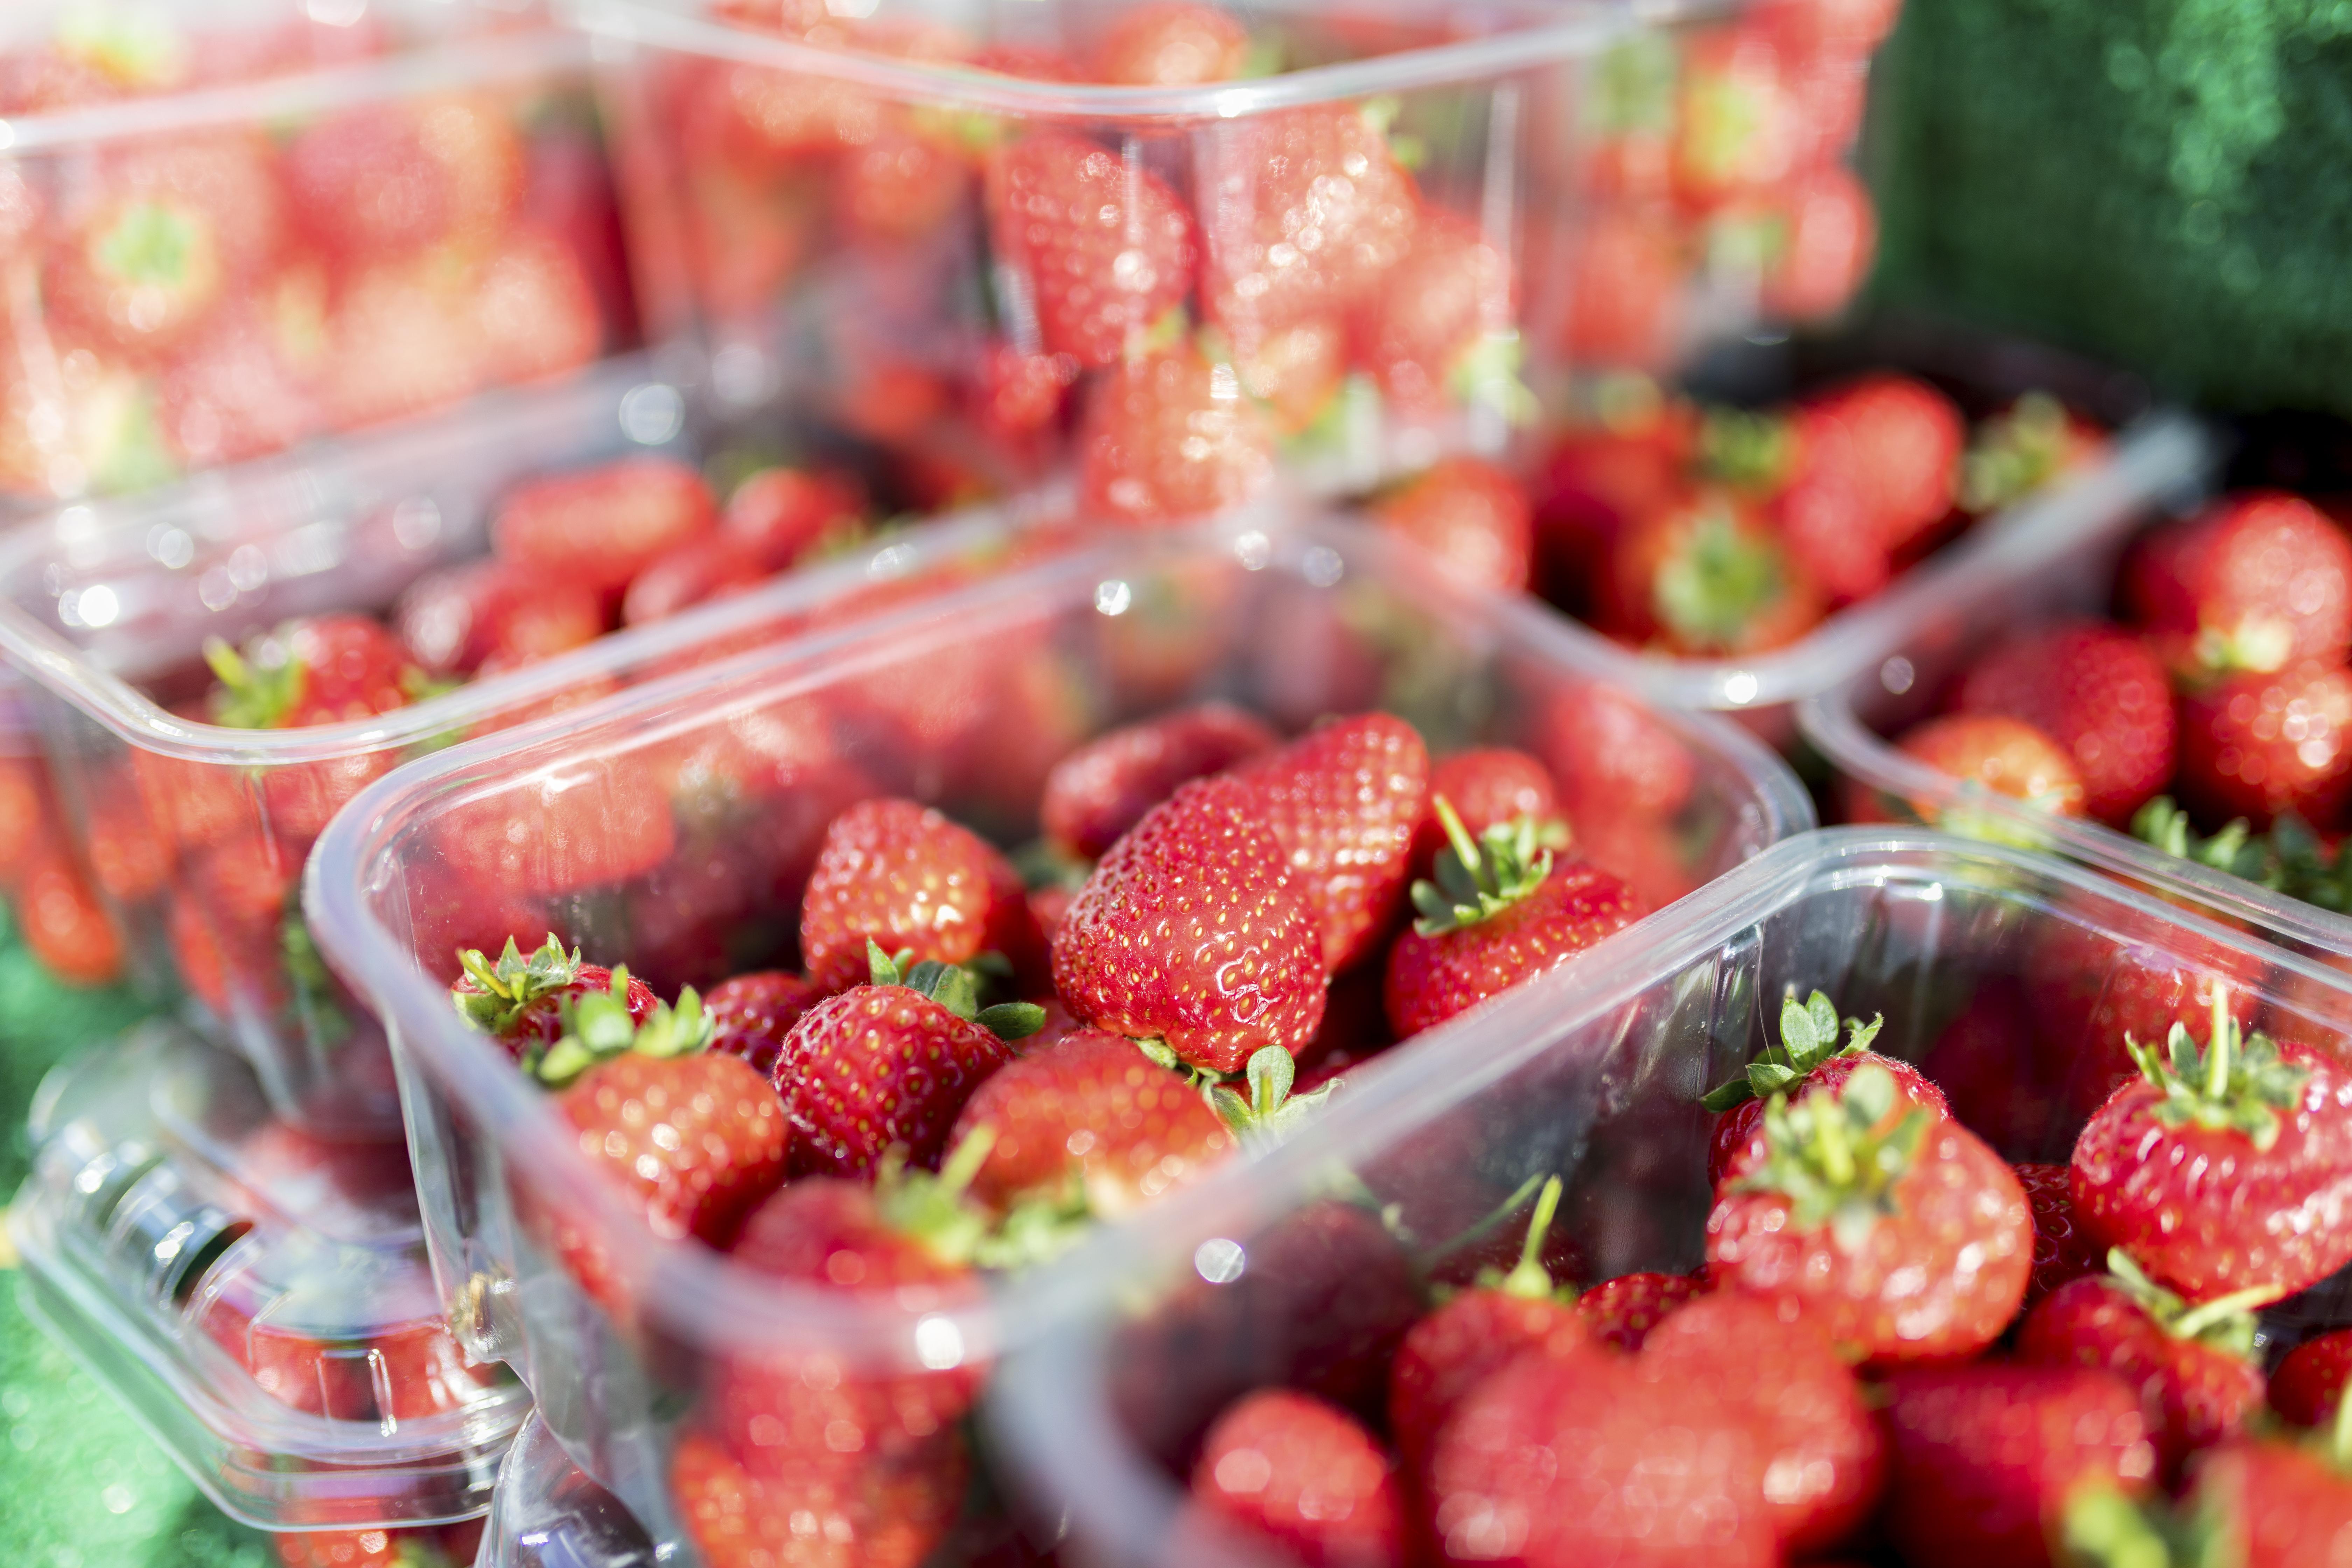 Fresh, ripe summer strawberries in plastic cartons.